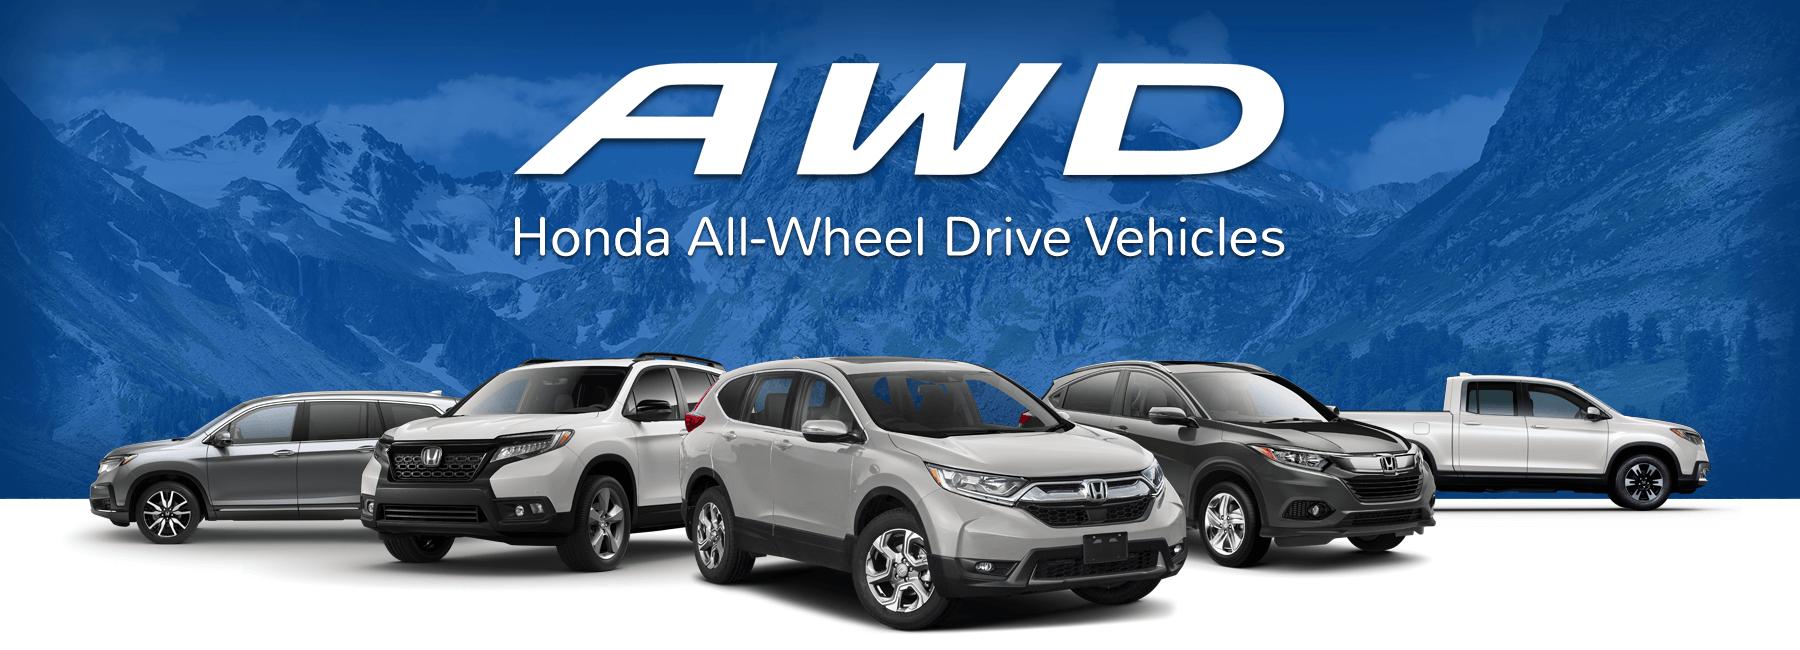 Honda All-Wheel Drive Lineup Slider